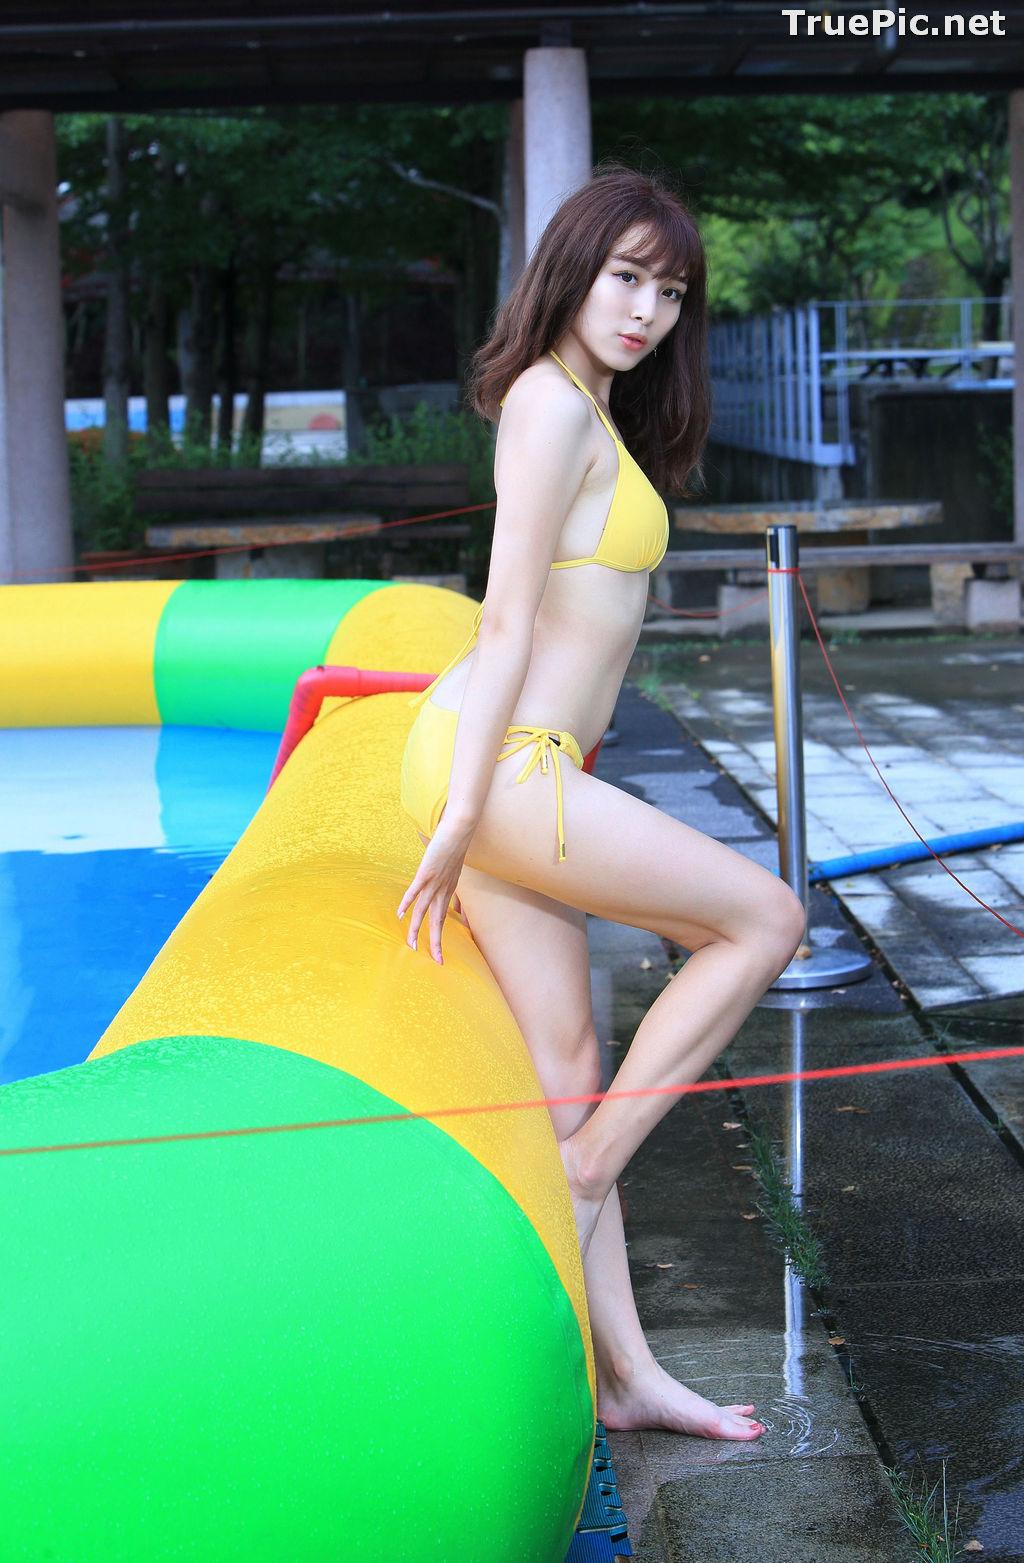 Image Taiwanese Model - Ash Ley - Yellow Bikini at Taipei Water Museum - TruePic.net - Picture-62